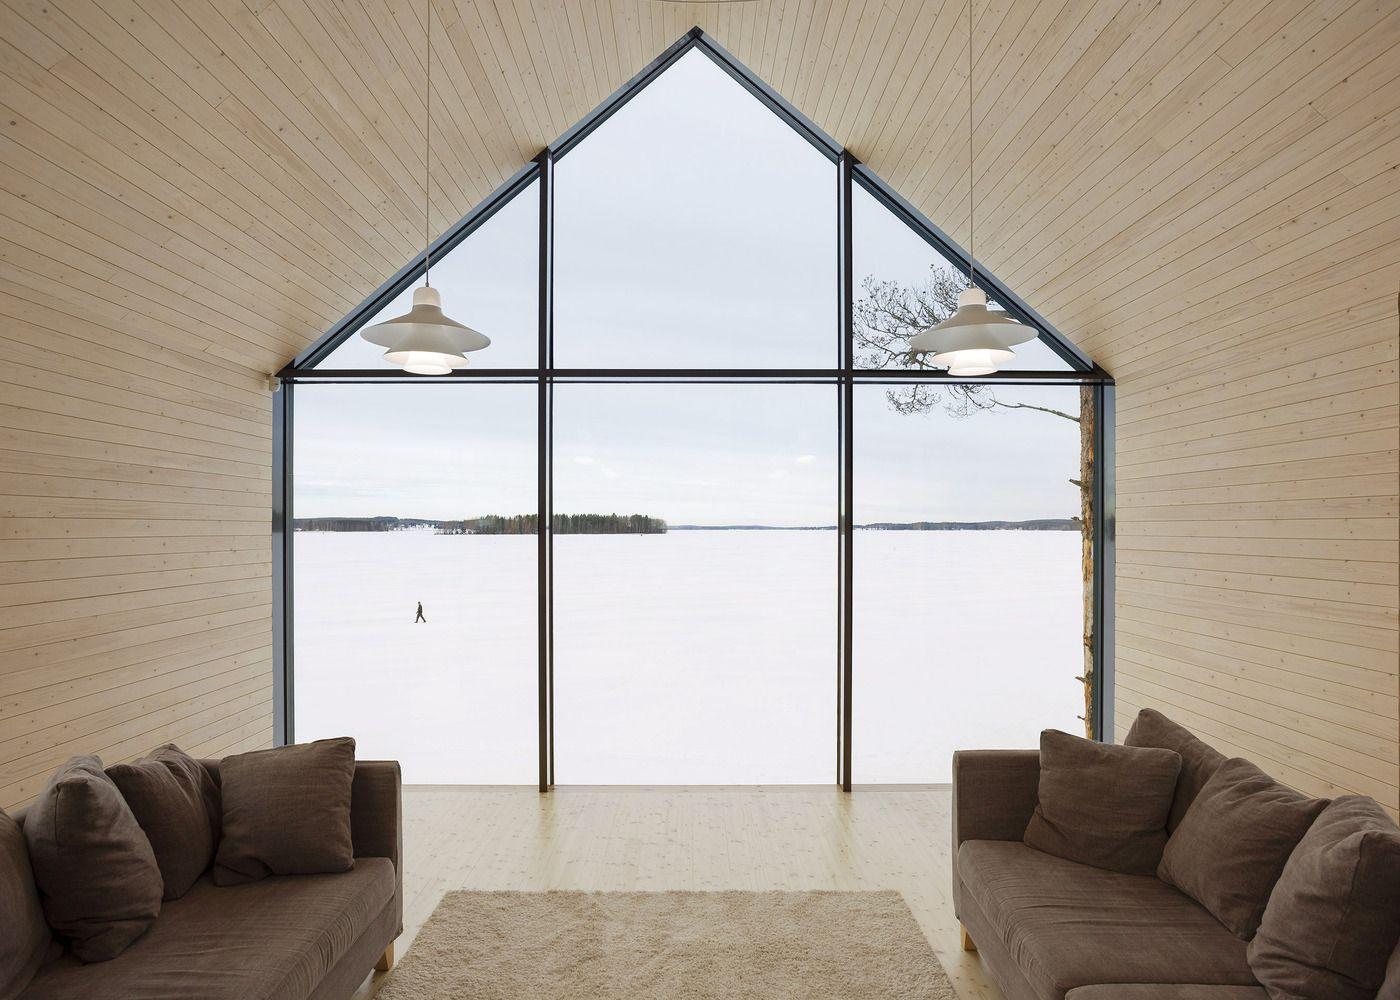 Modern window house design  gallery of house y  arkkitehtitoimisto teemu pirinen